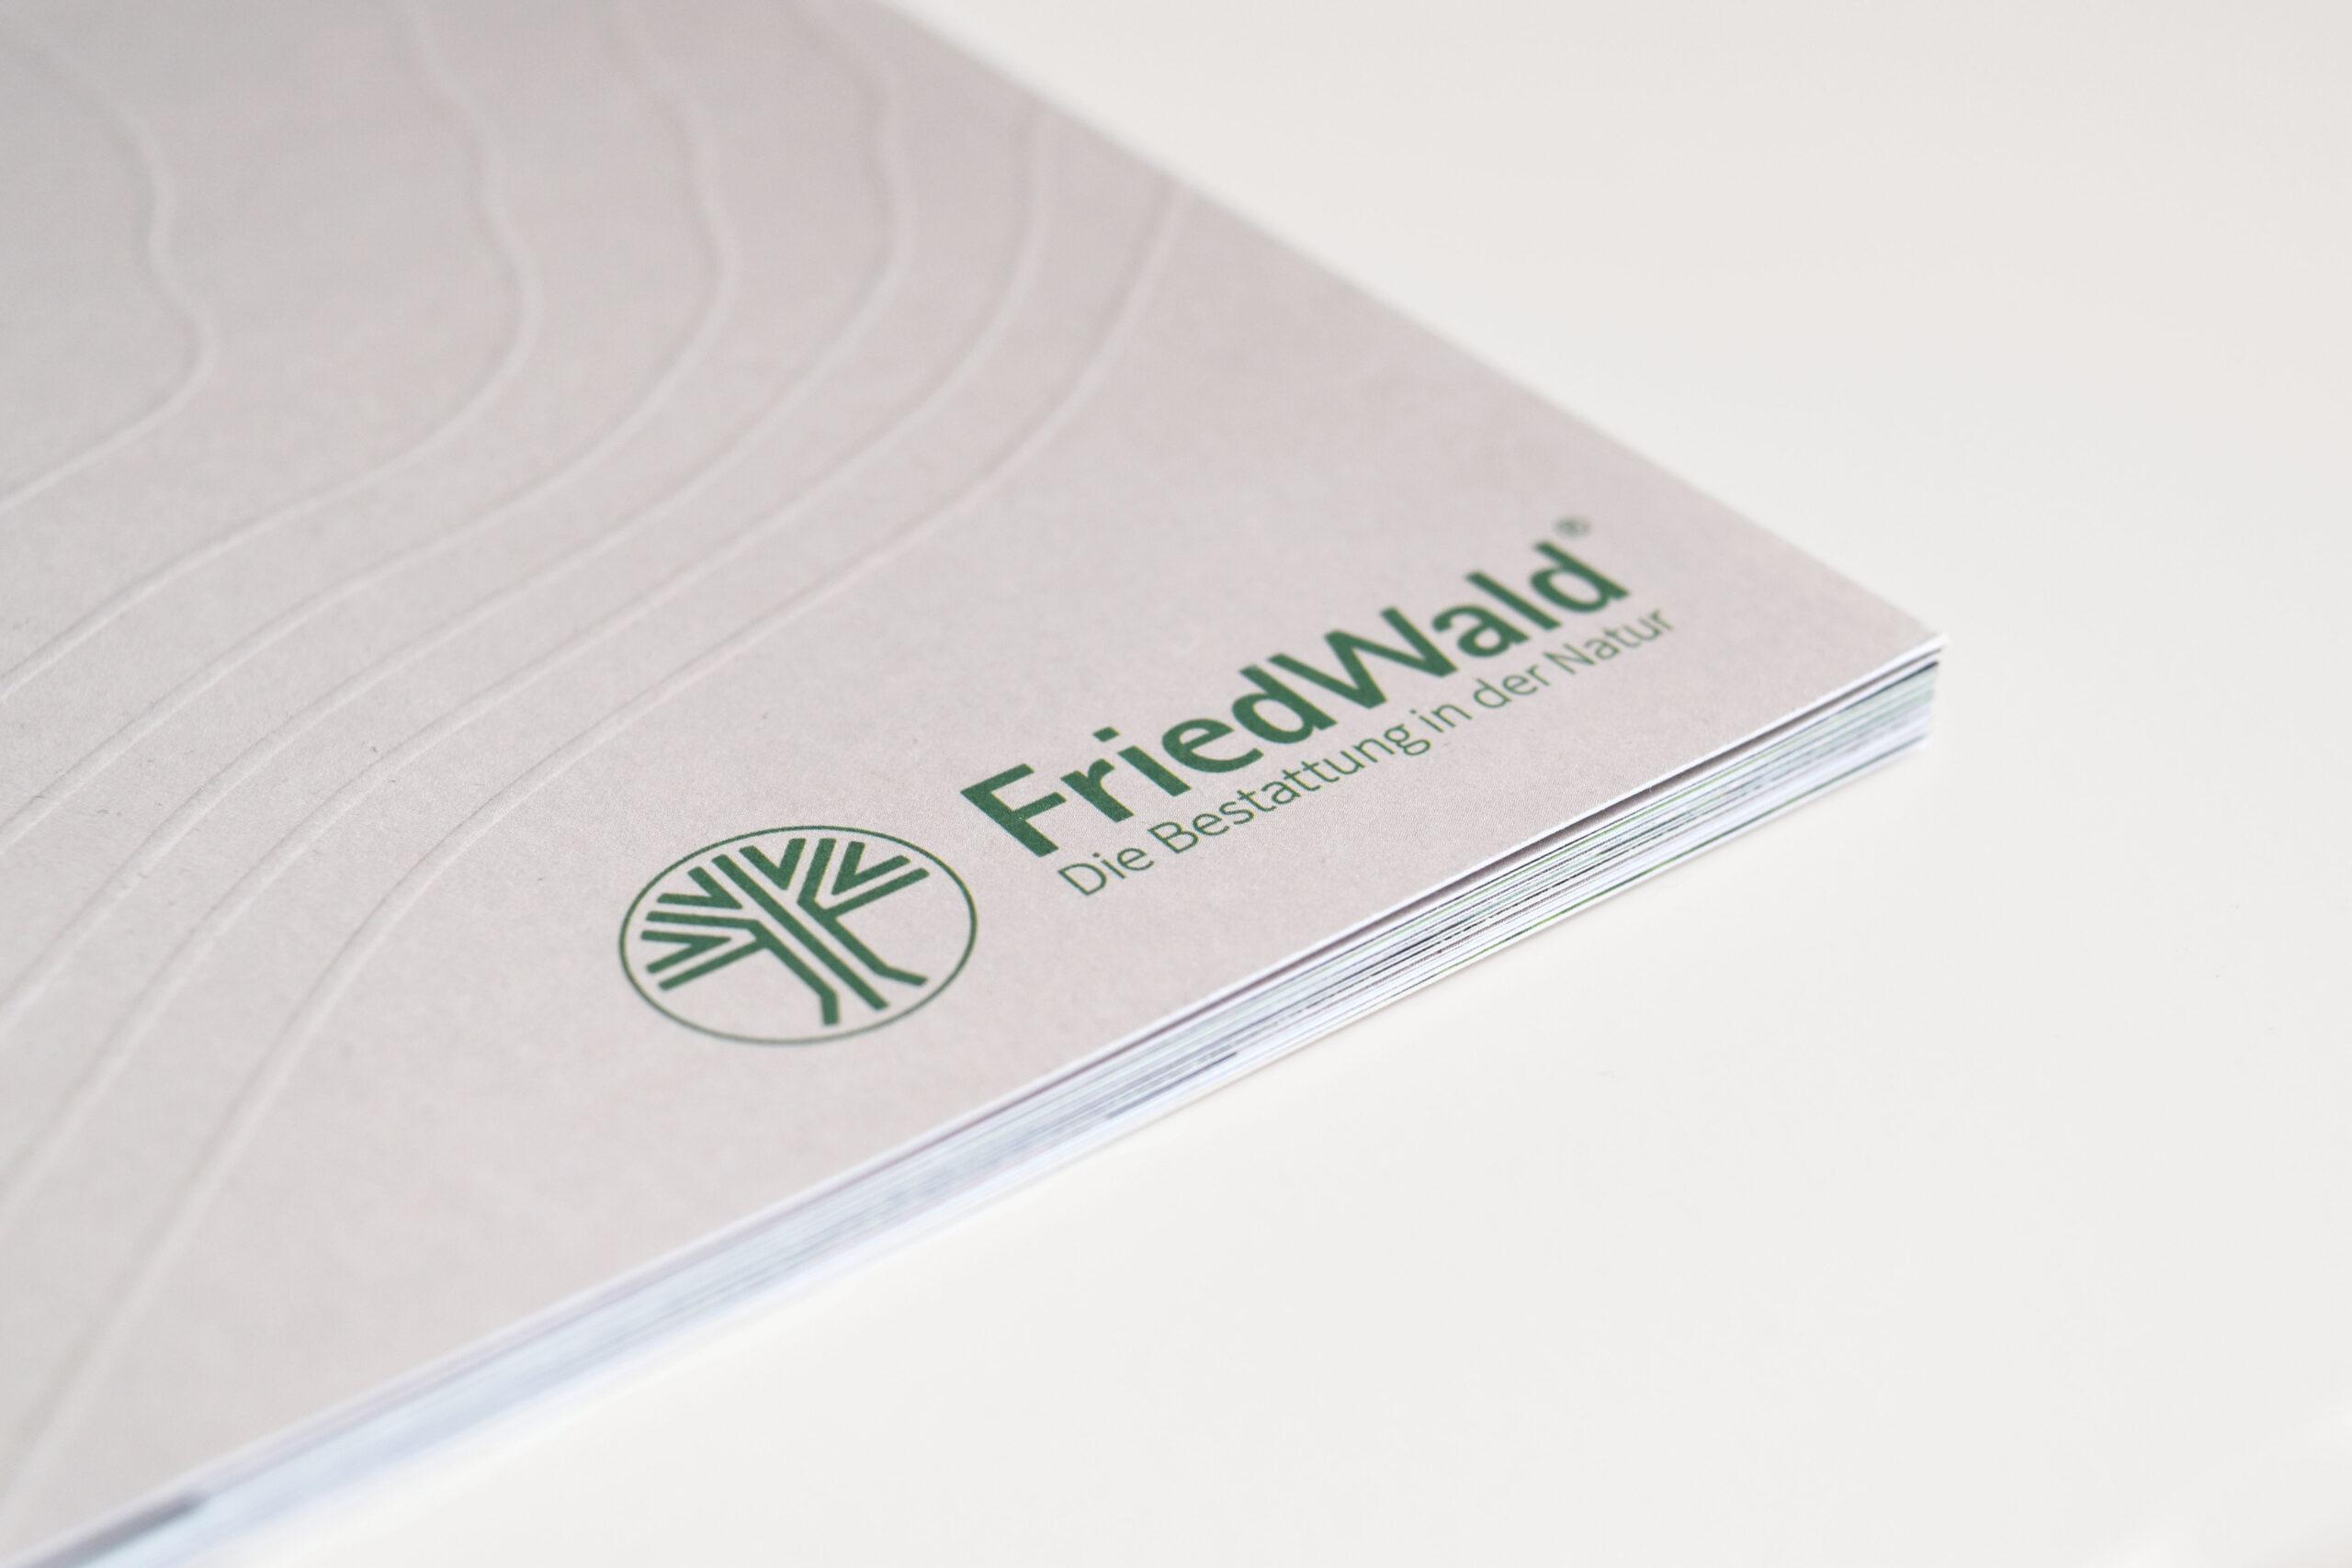 Case-Study-FriedWald-Material_Imagebroschuere-01_cropped